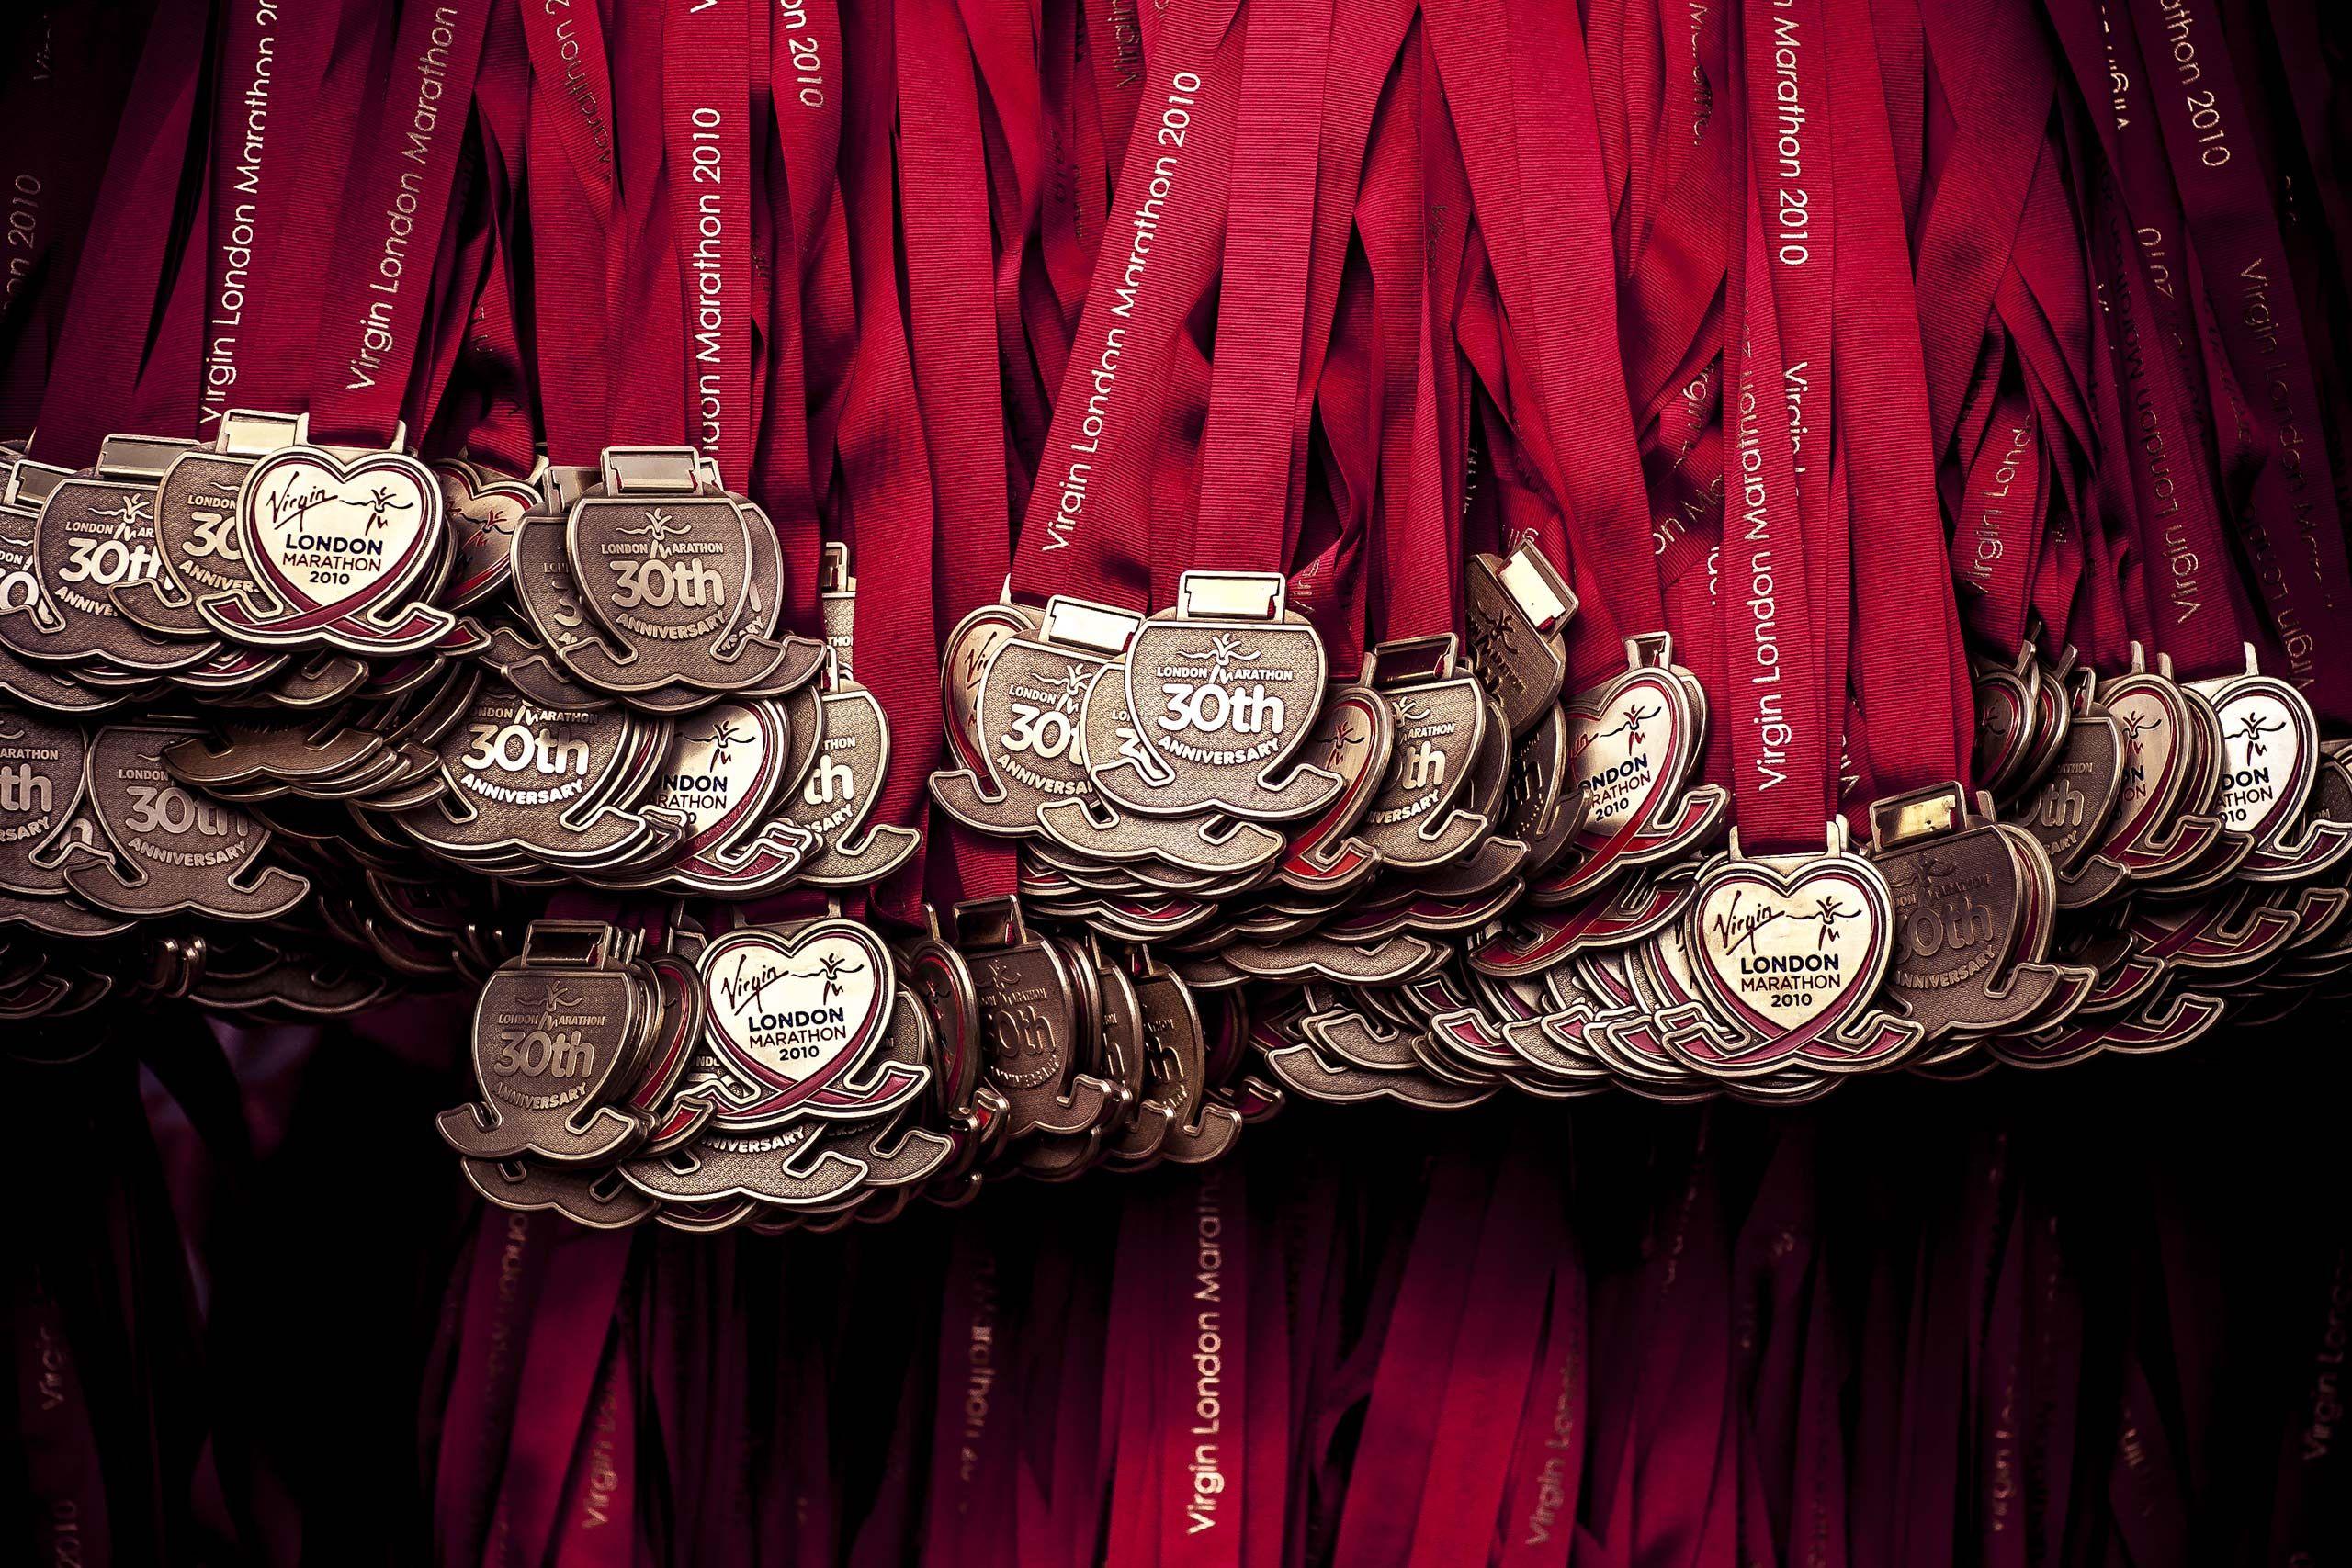 London_Marathon_Virgin_medals.jpg